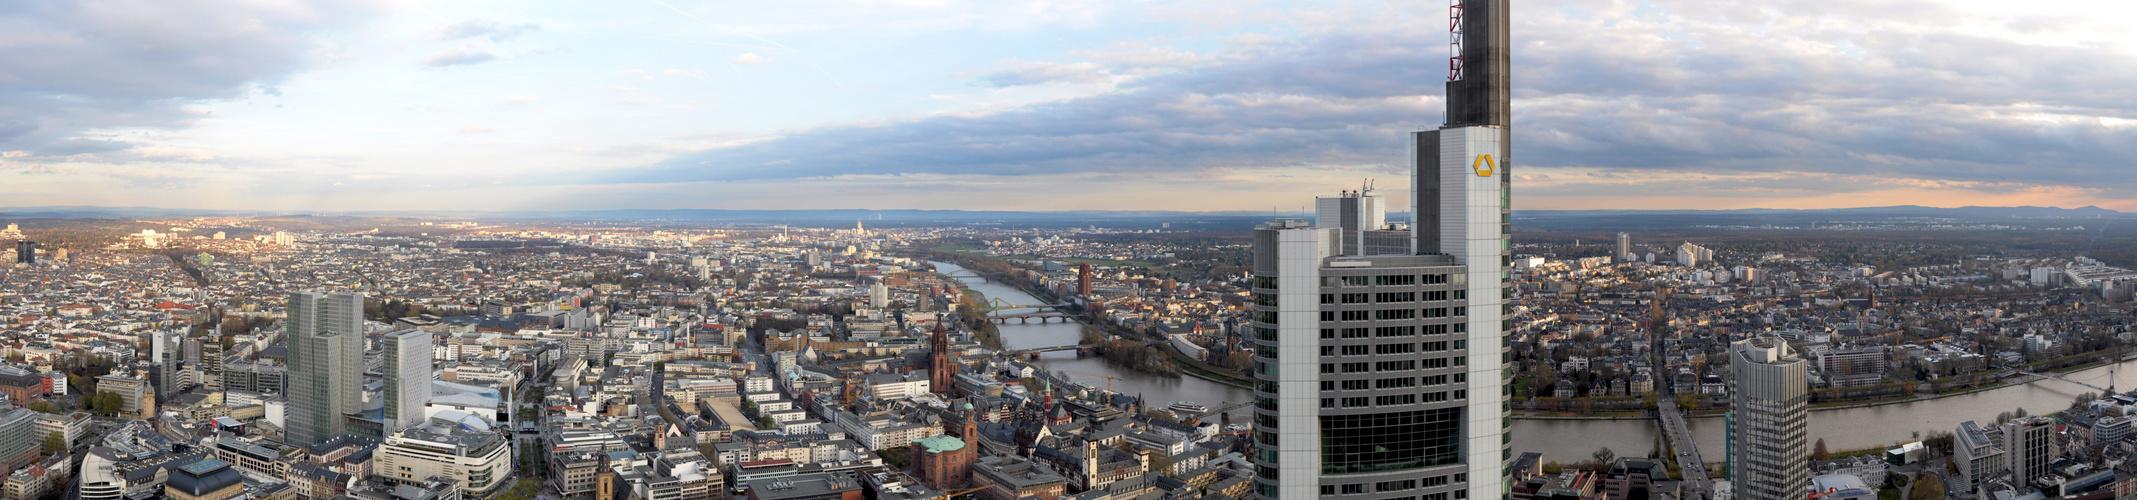 14-11-2010